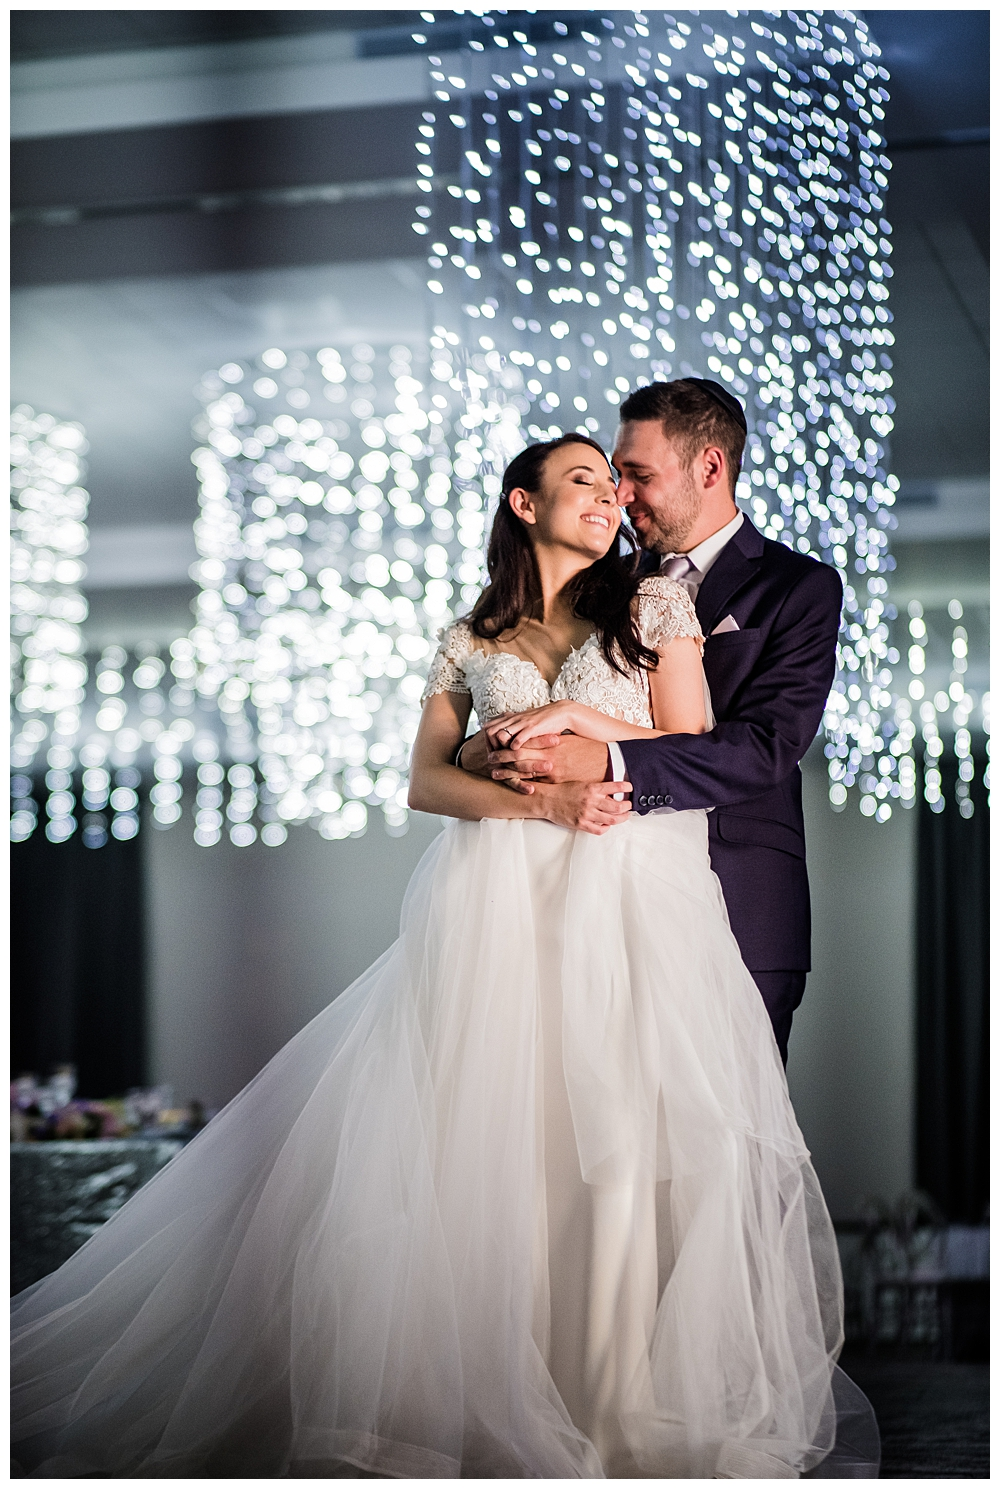 Best_Wedding_Photographer_AlexanderSmith_0222.jpg